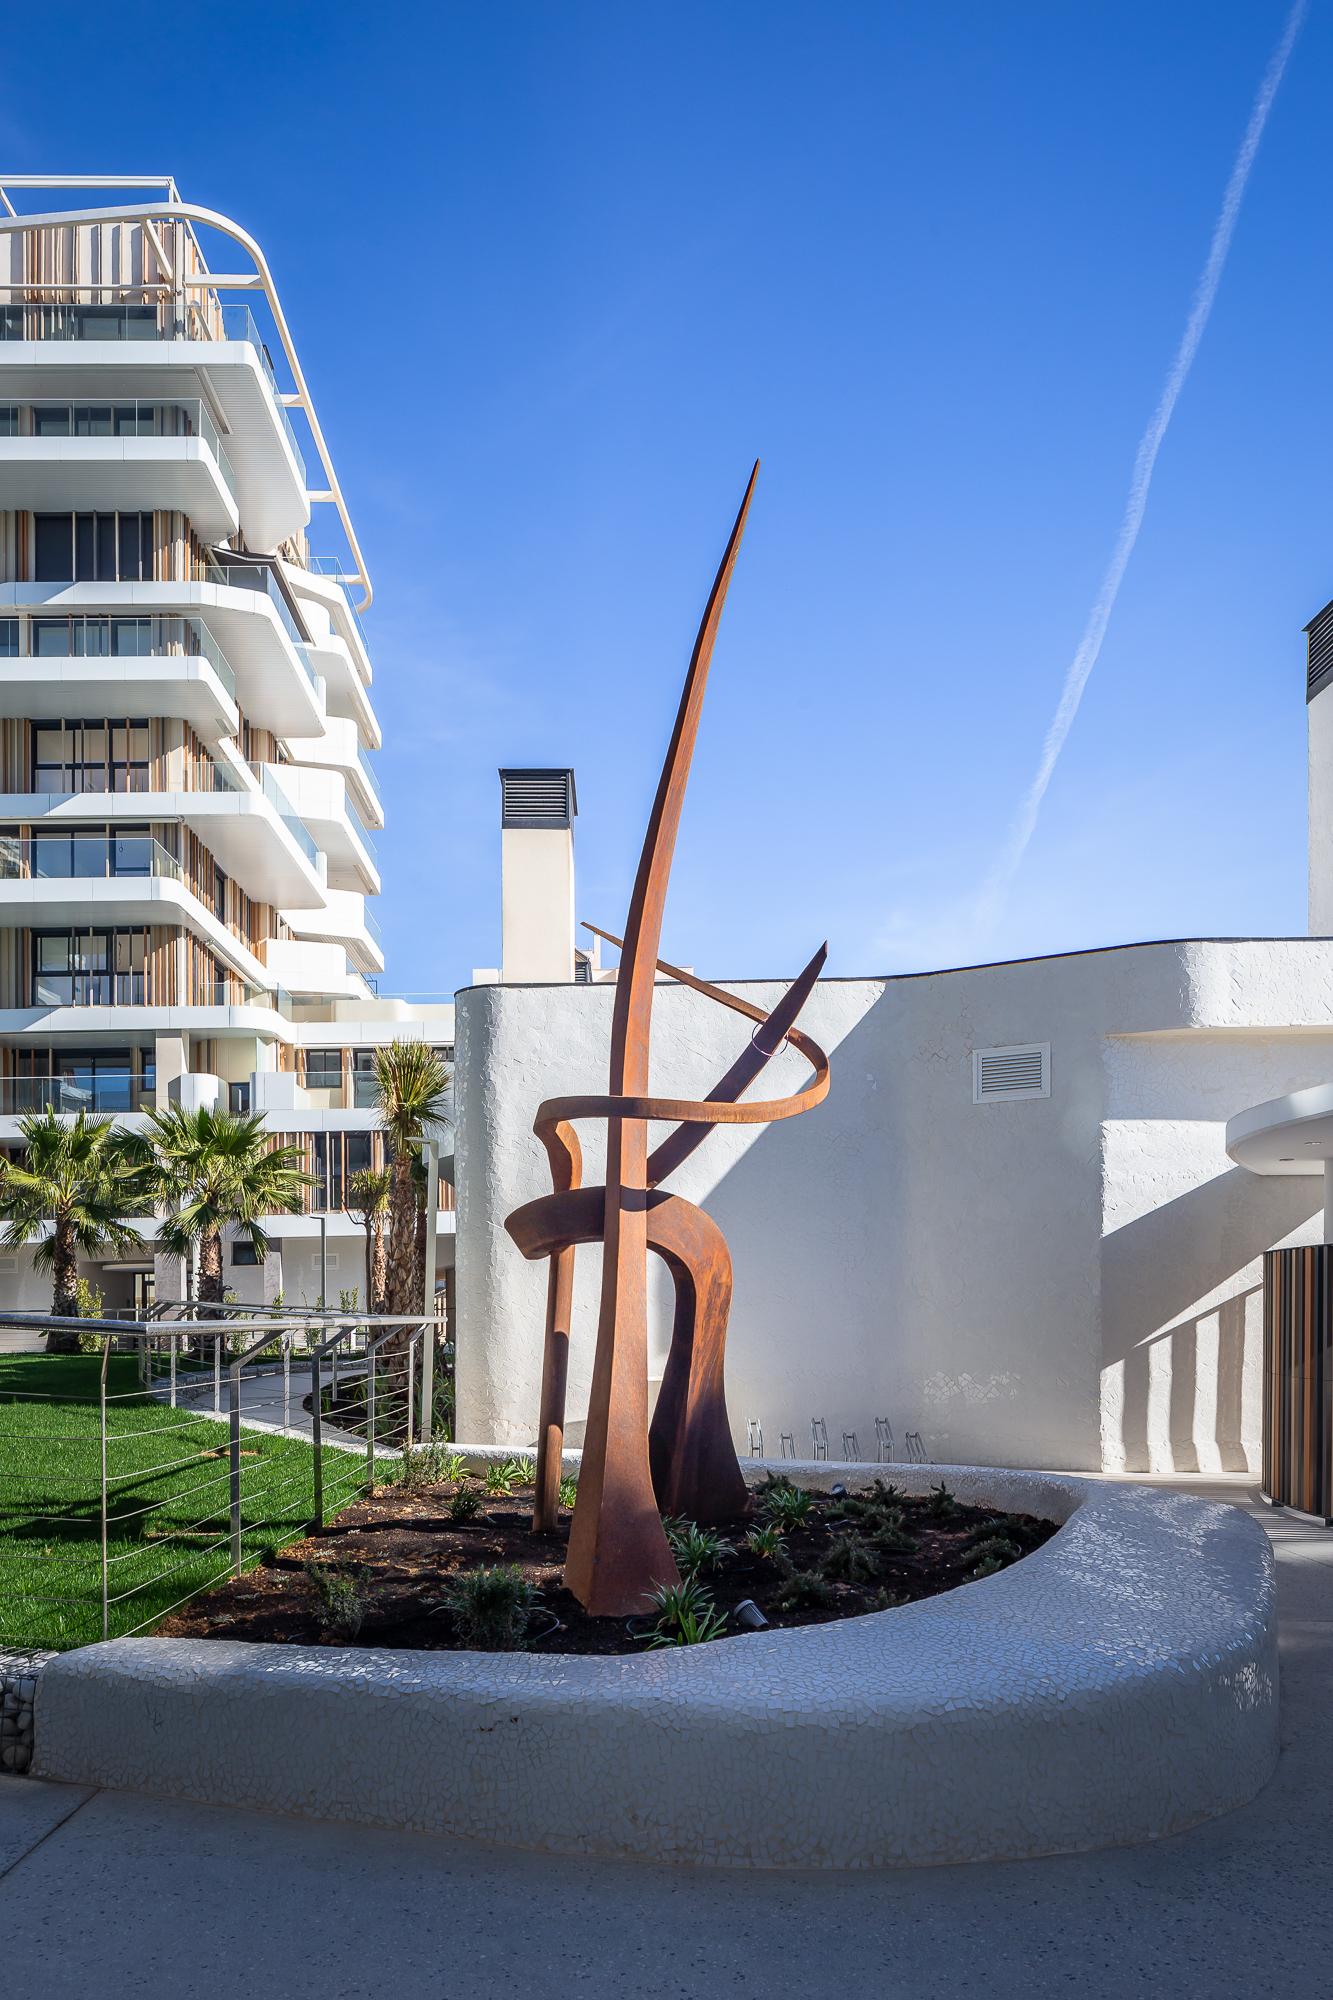 Tango in Nature, escultura realizada por Peter Cauro para el Residencial Nature.